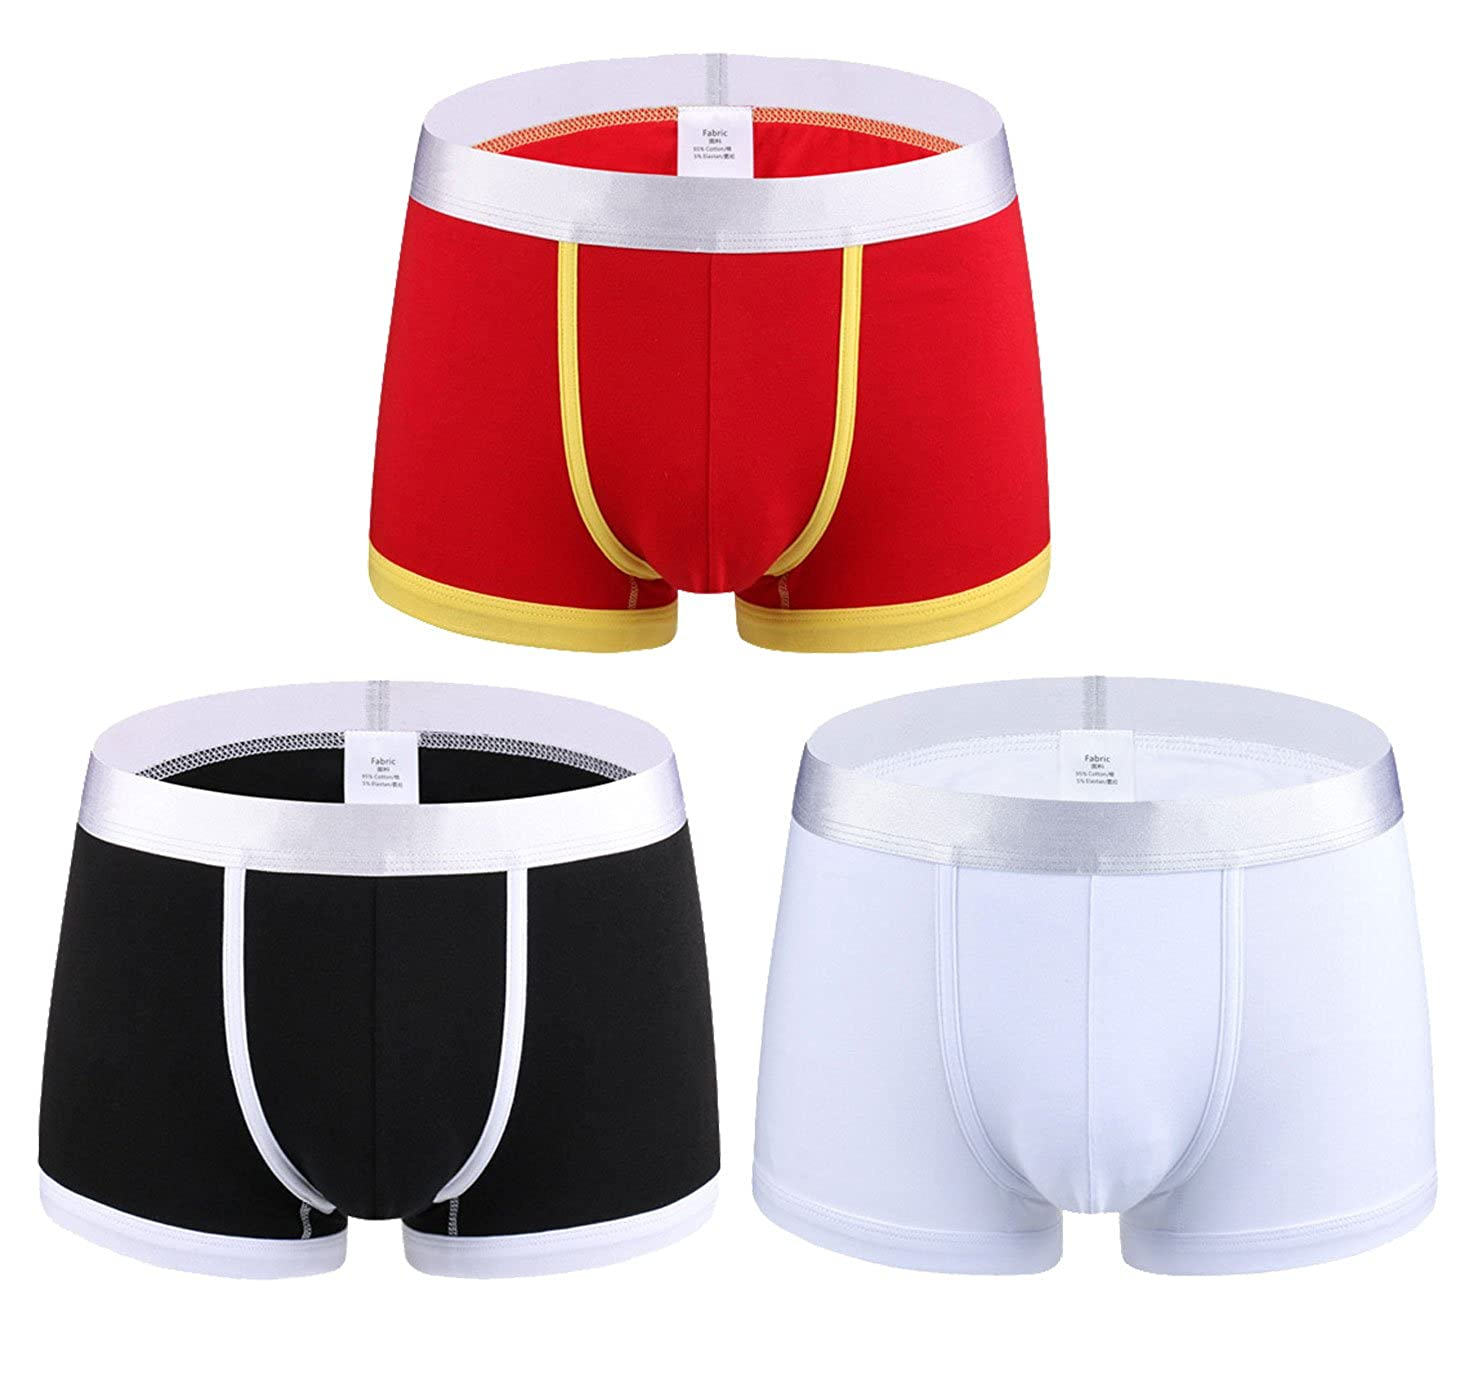 FEMAROLY Mens Underwear Cotton Students Elastic Breathable Boxer Briefs 3-Pack